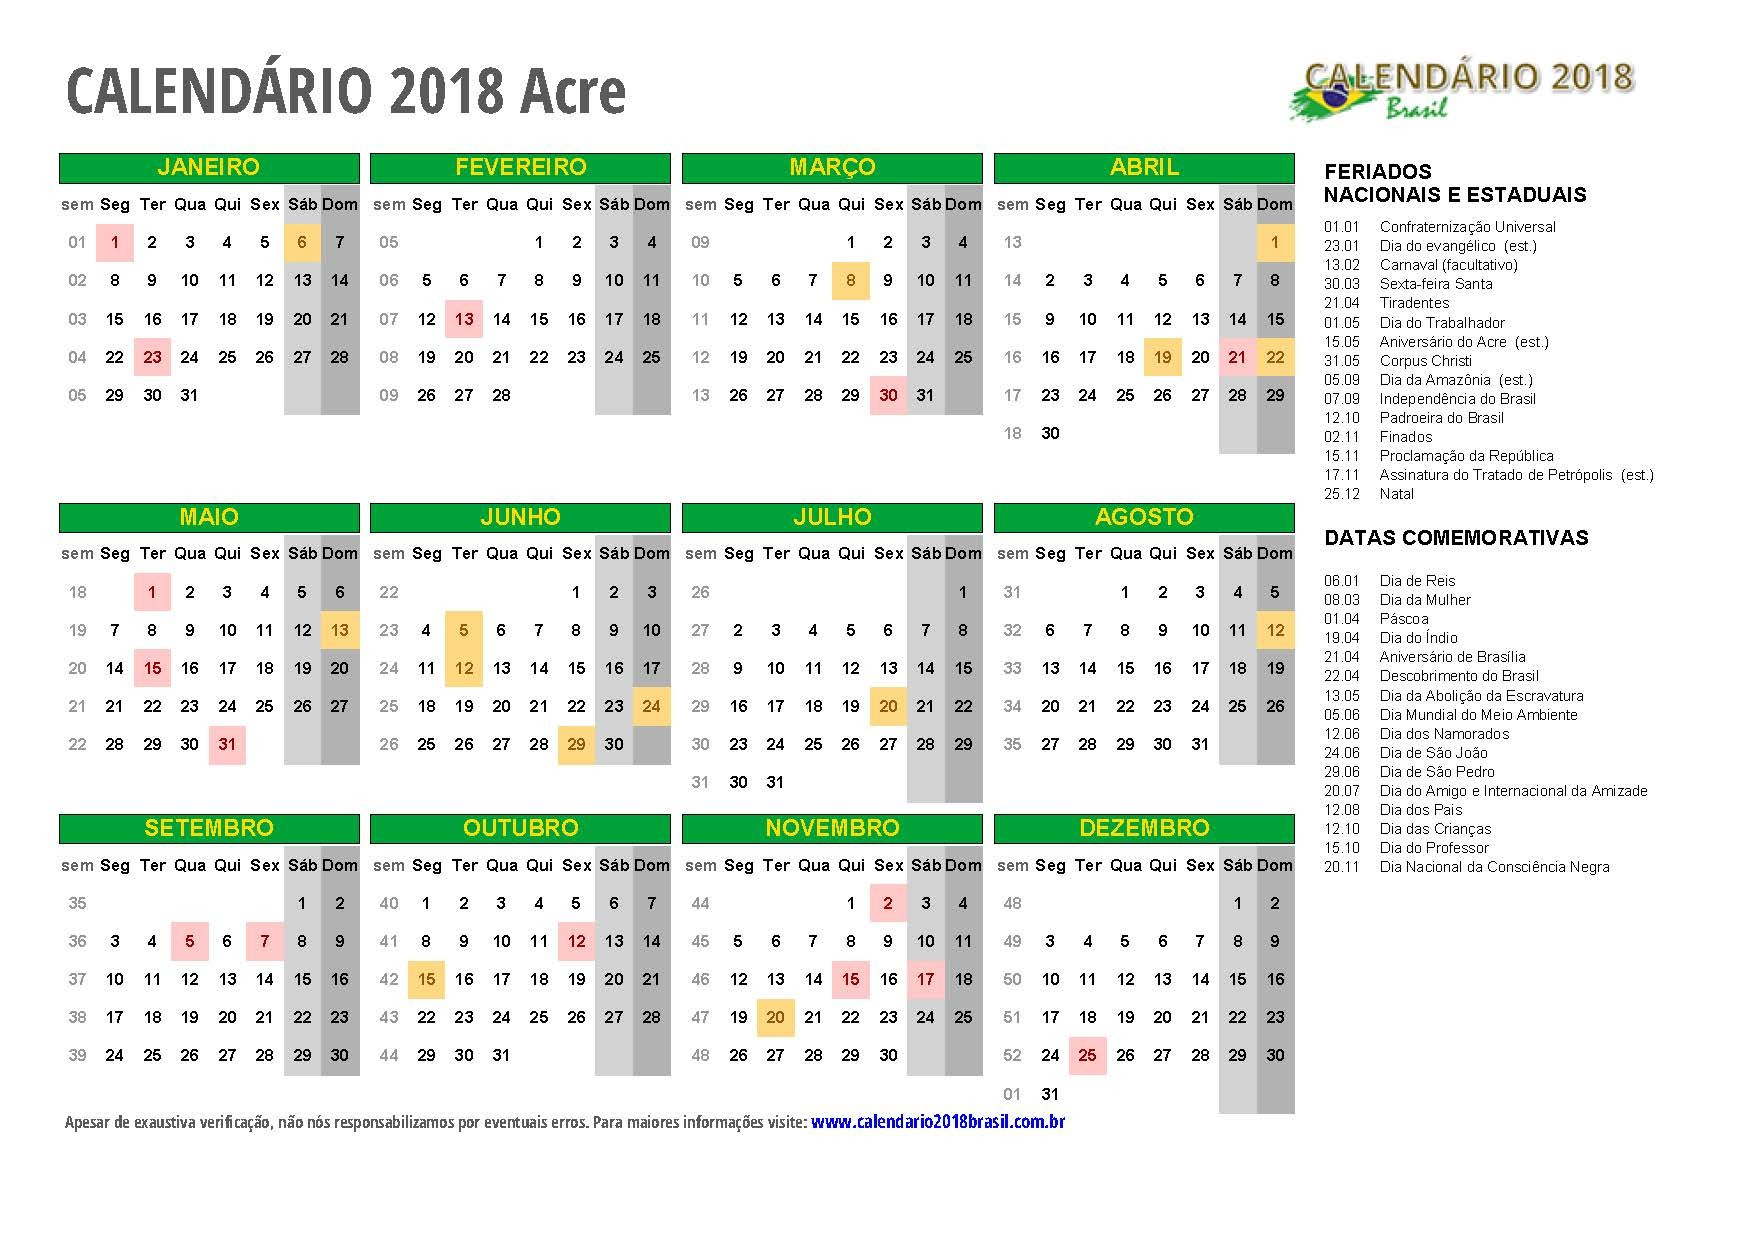 Calendario 2017 Para Escrever E Imprimir Más Actual Calendrio 2018 Para Imprimir Feriados